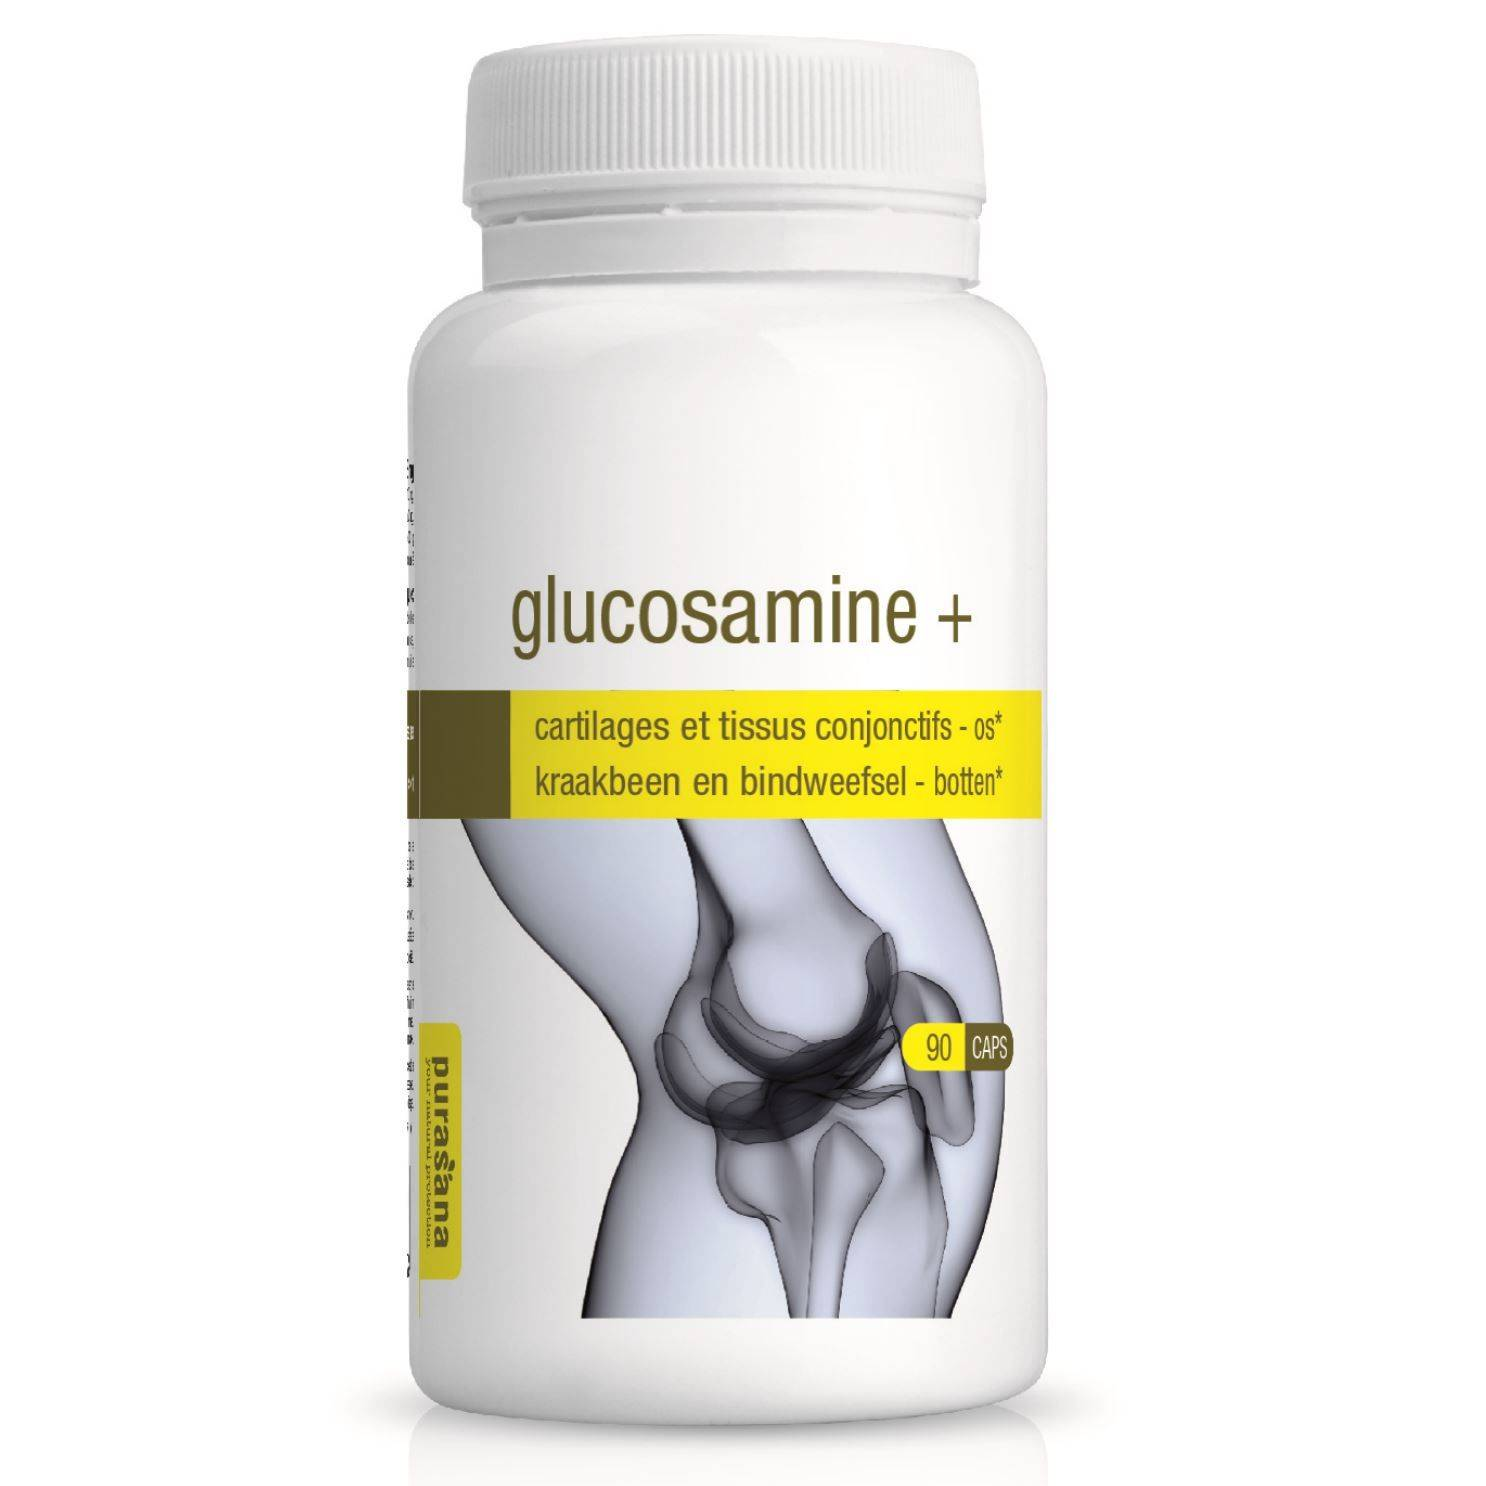 Purasana Glucosamine - Cartilages et tissus conjonctifs 90 gélules - Purasana